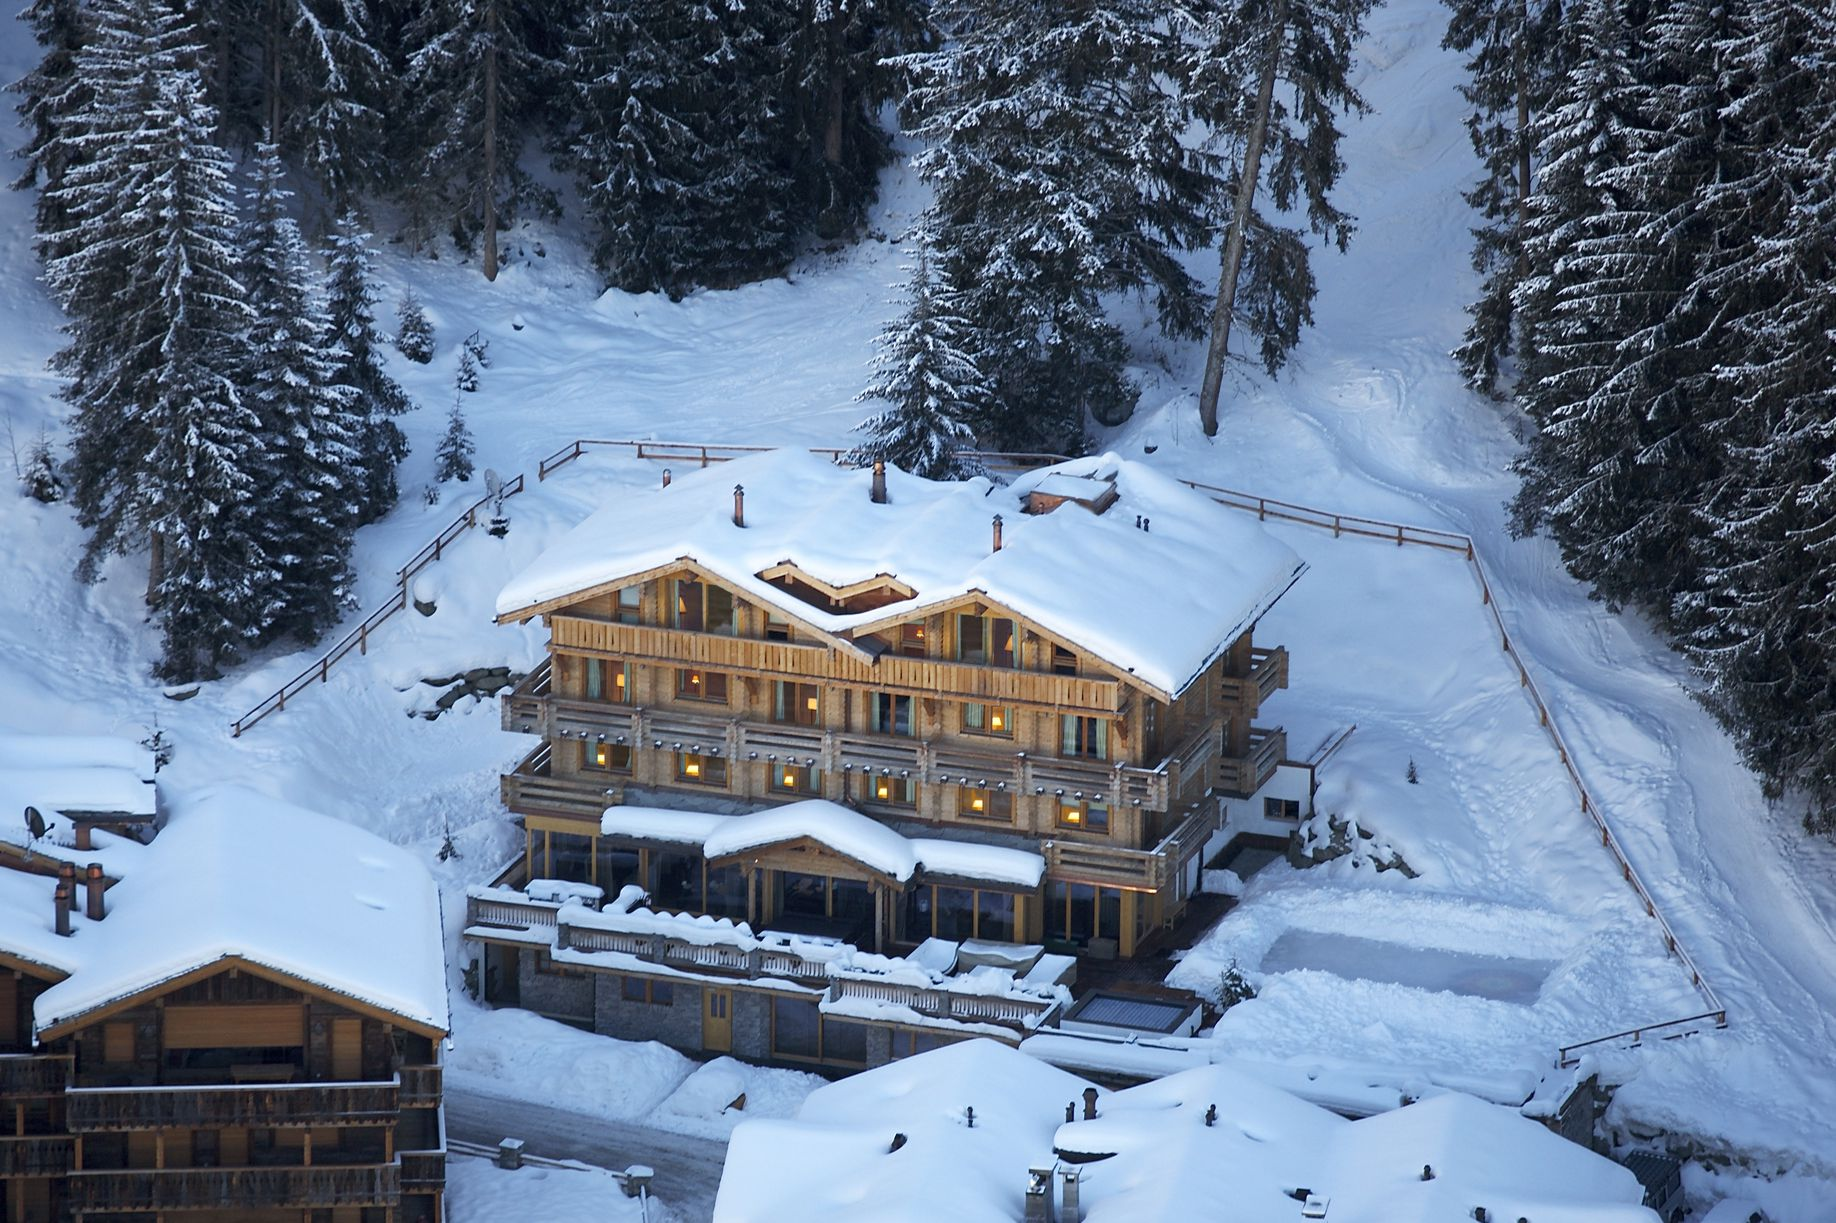 Альпийский курорт The Lodge Verbier Switzerland от HONKA